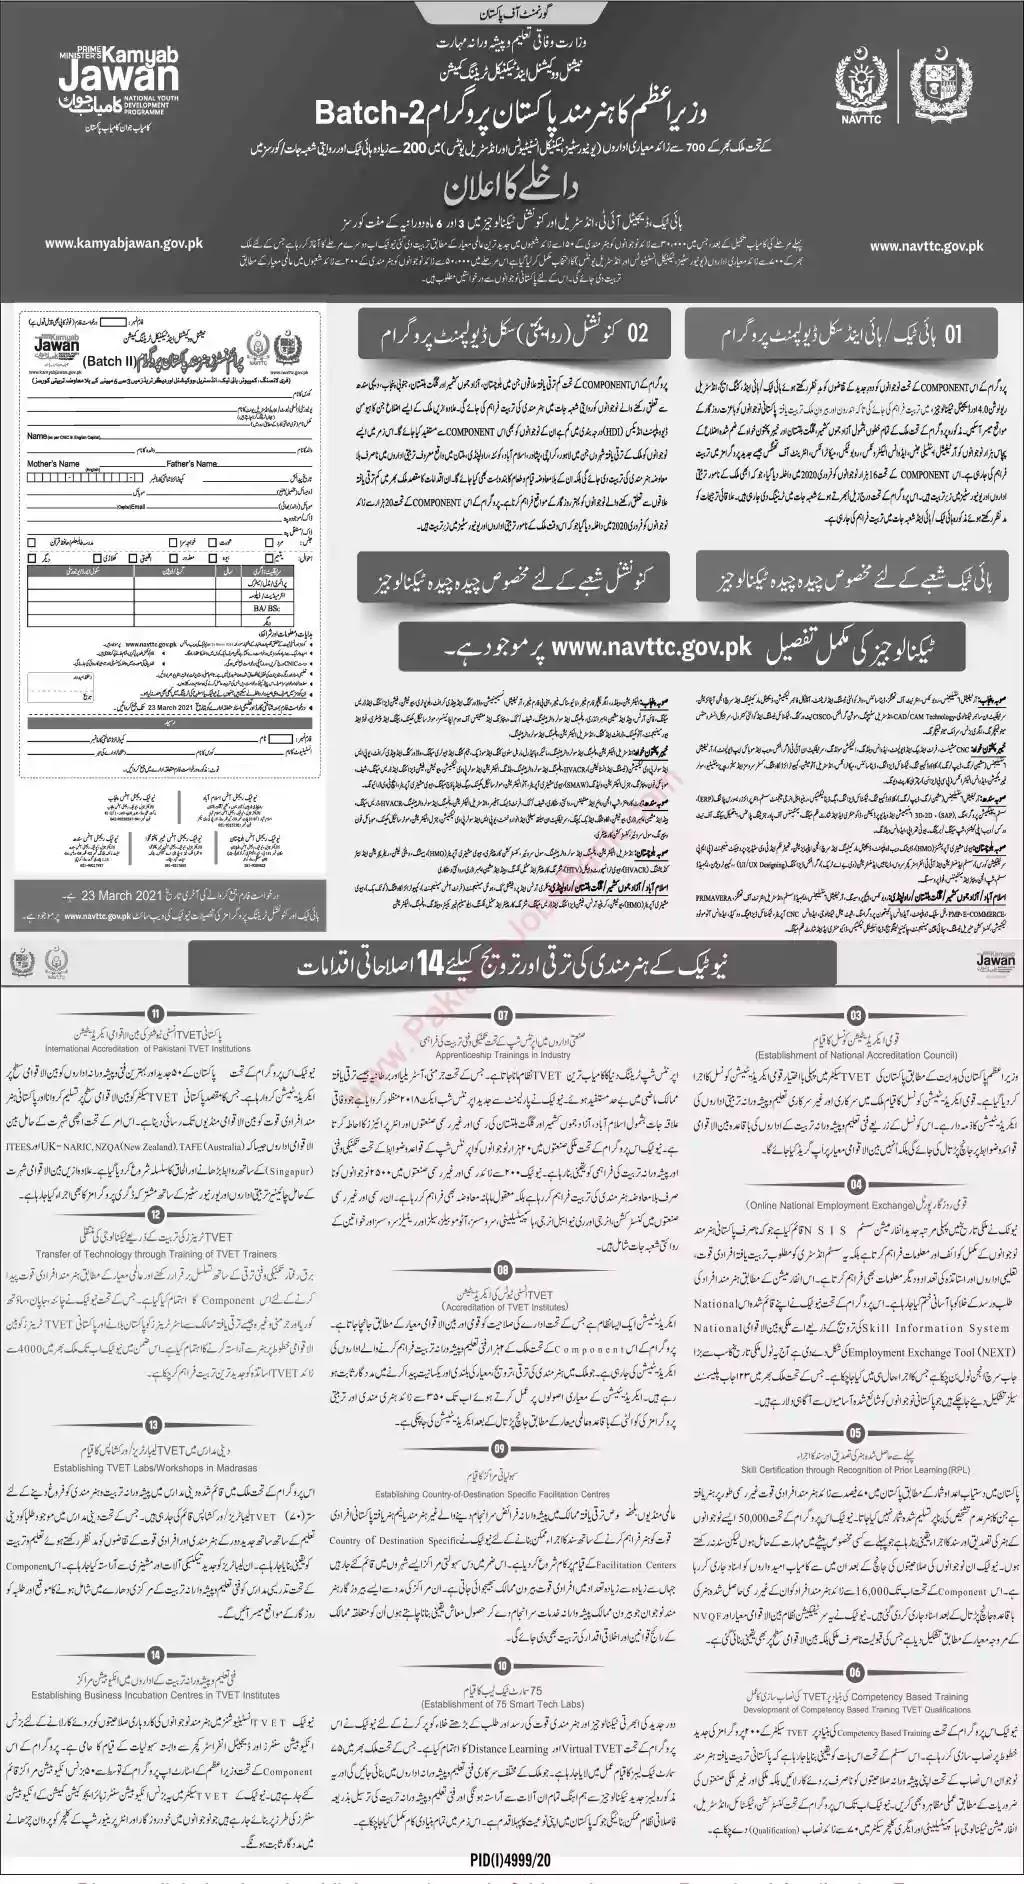 New Jobs in Pakistan Prime Minister Kamyab Jawan Hunarmand Pakistan Program Batch 2 2021   Download Application Form